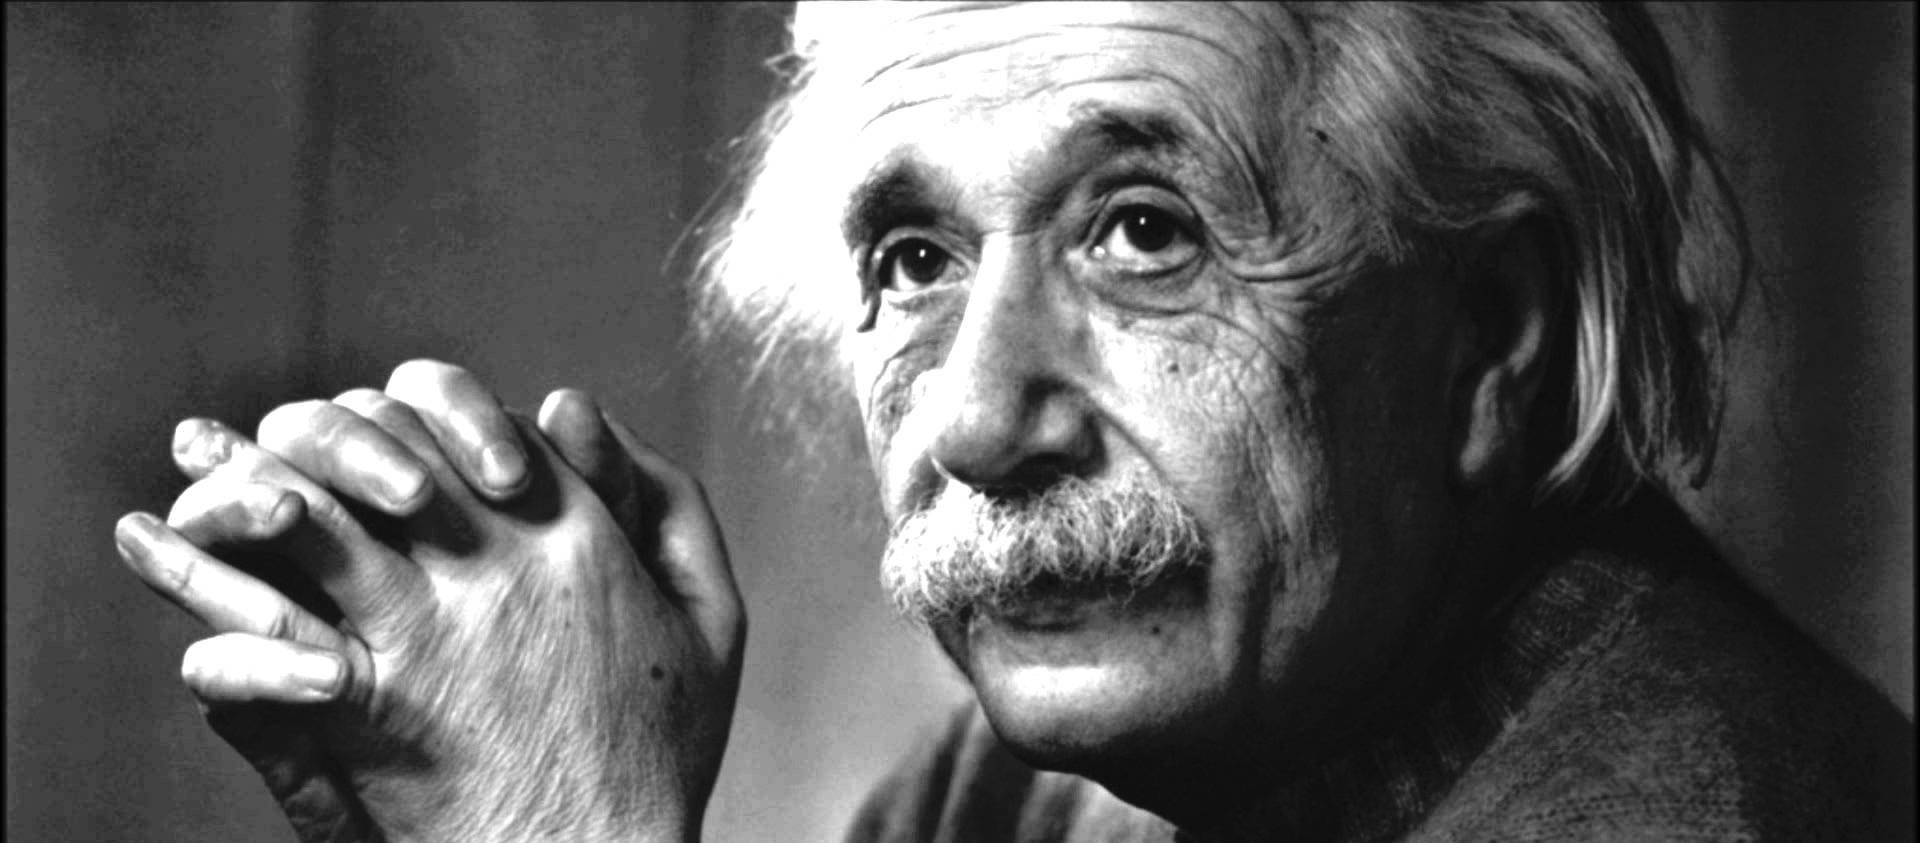 8. trening / mislim da sam shvatio Einsteina